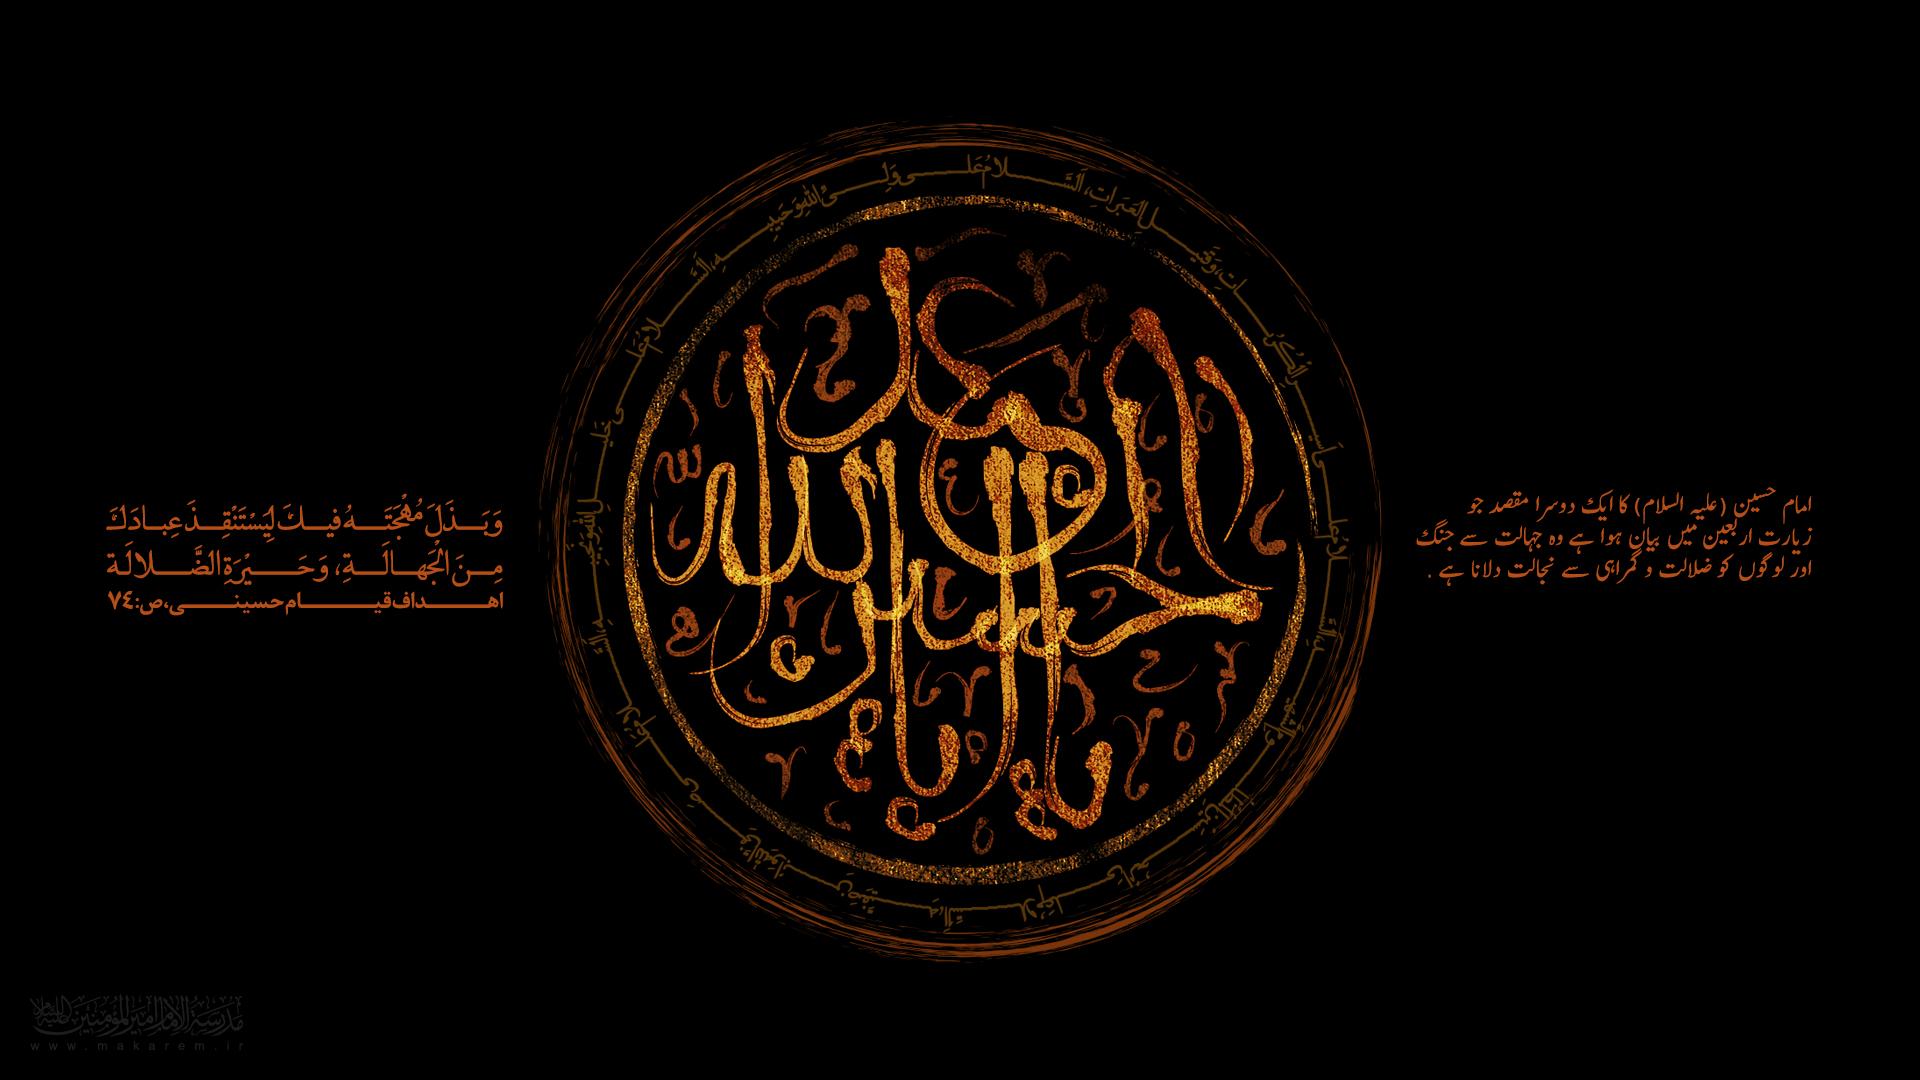 اربعین6-مدرسه الامام امیر المومنین (ع)